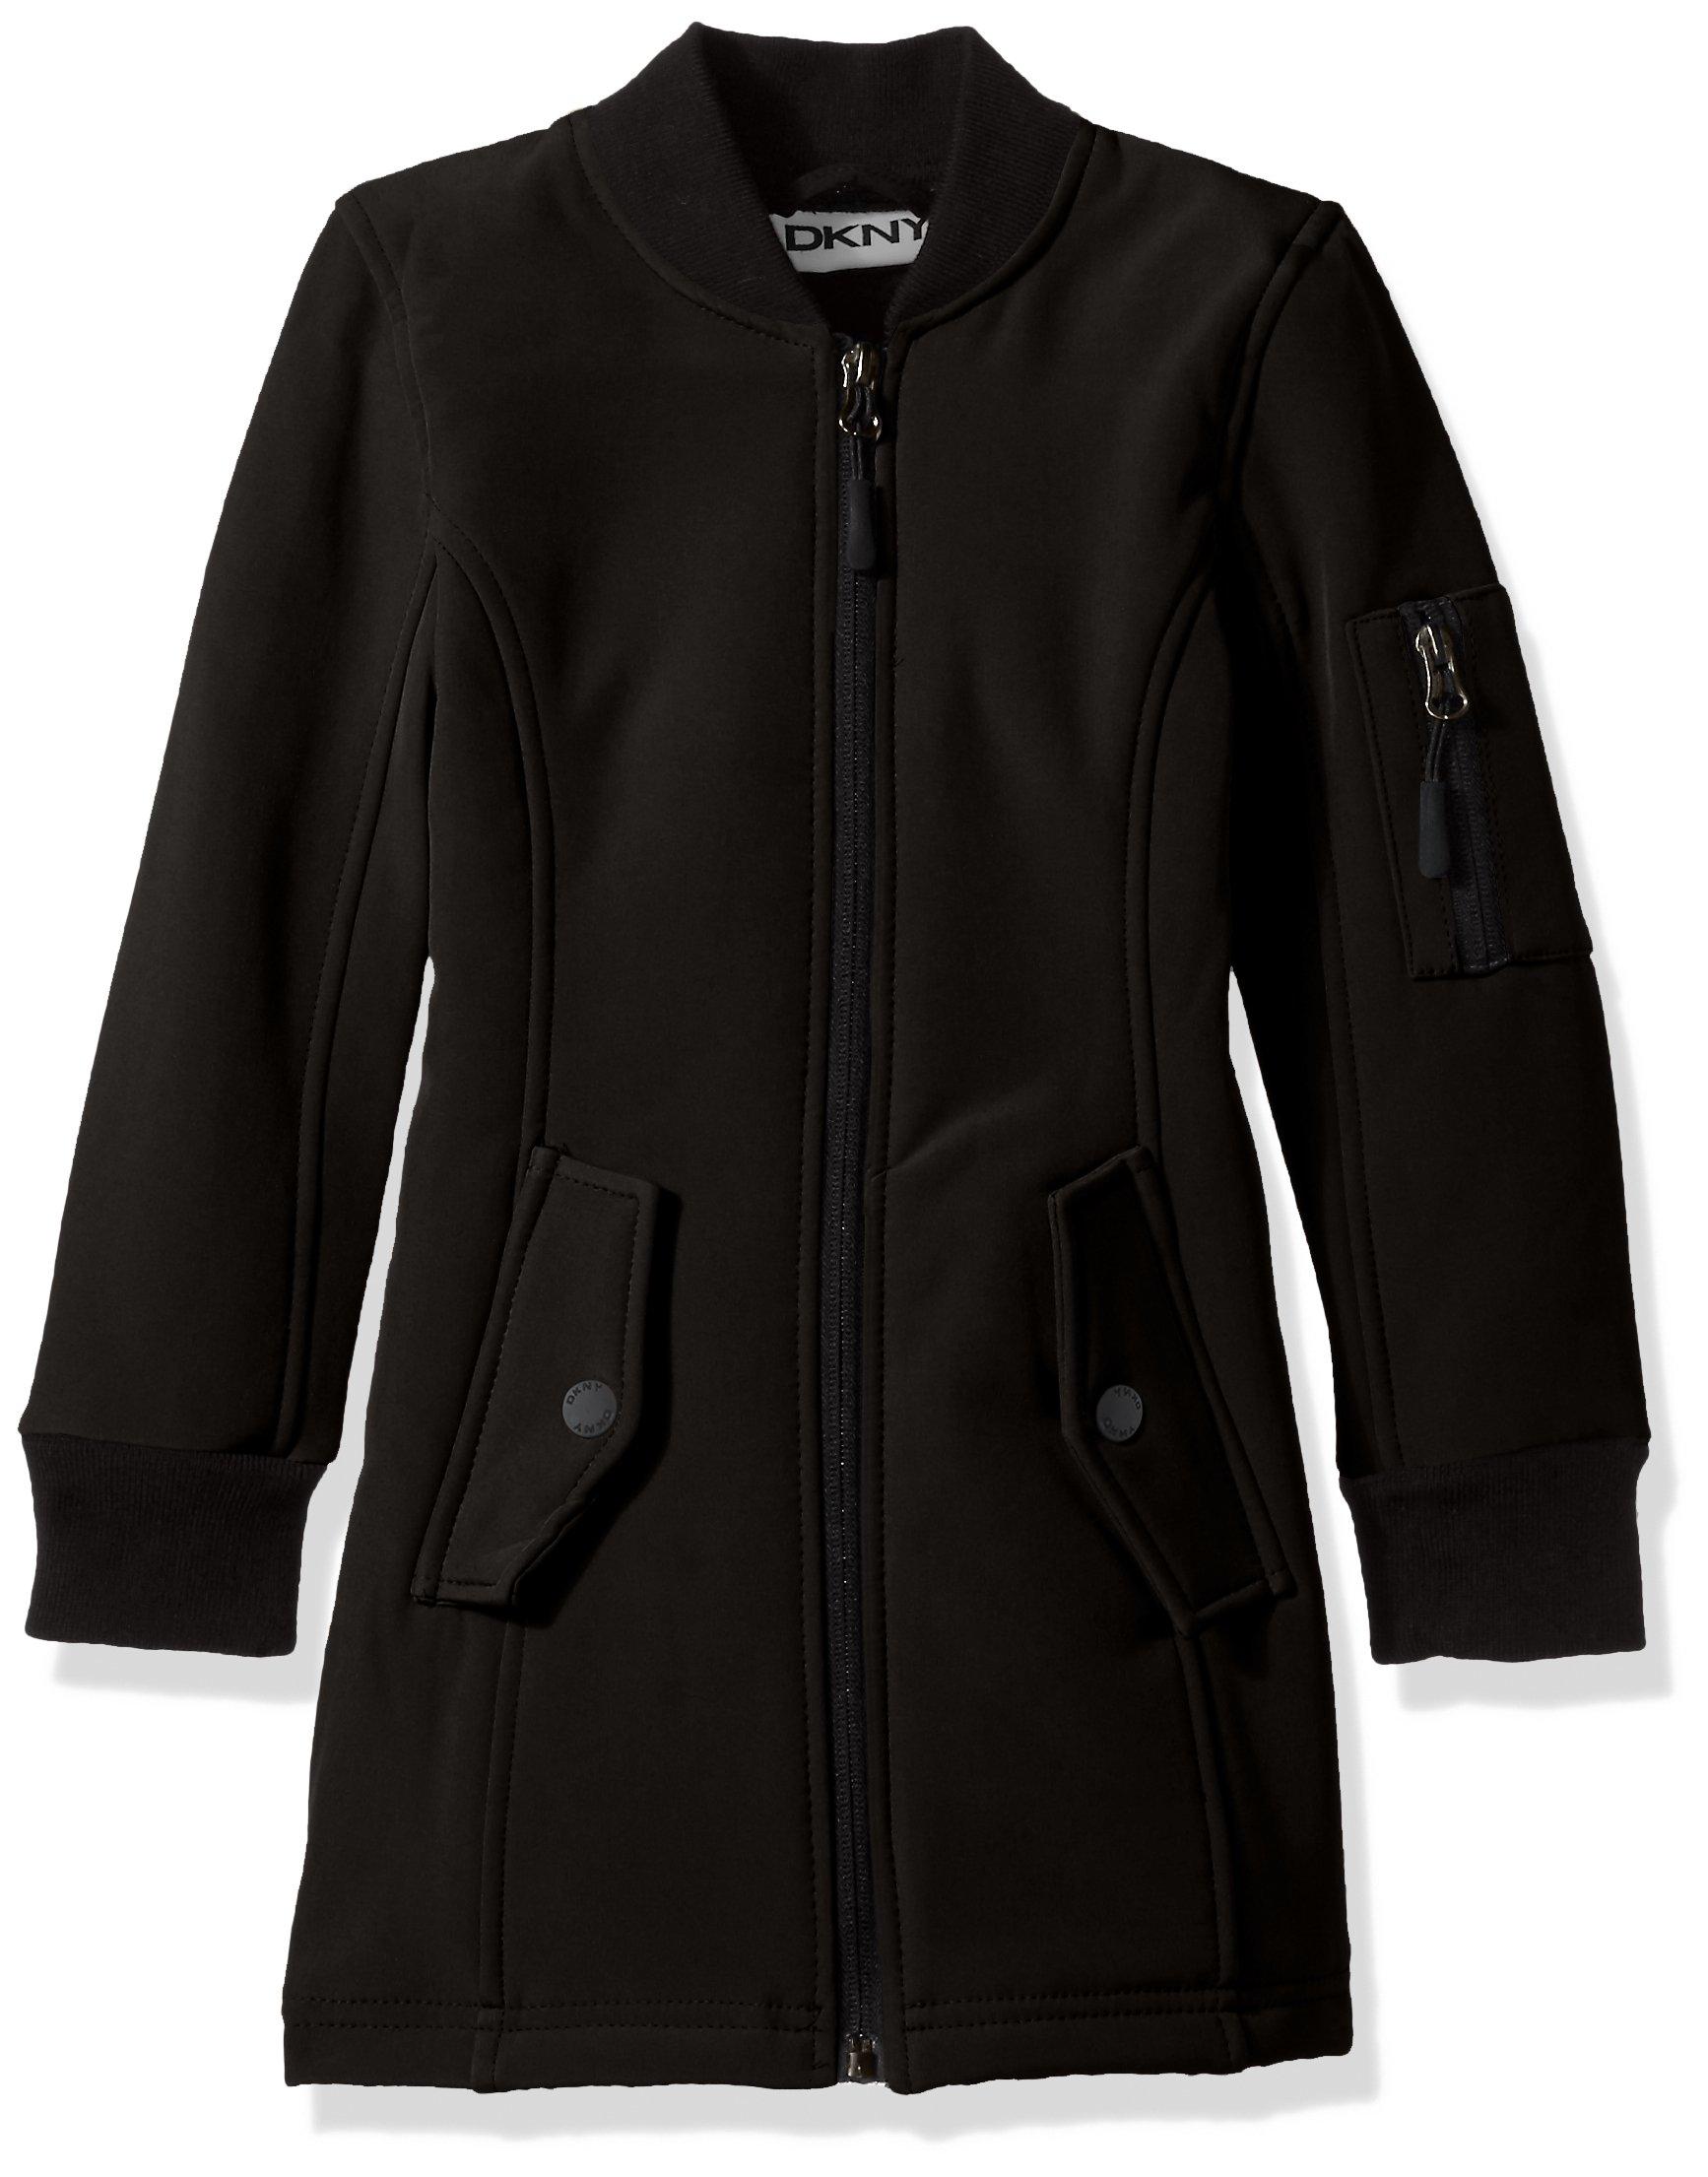 DKNY Little Girls' Long Outerwear Jacket (More Styles Avaialble), Softshell Bomber-DK54-Black, 5/6